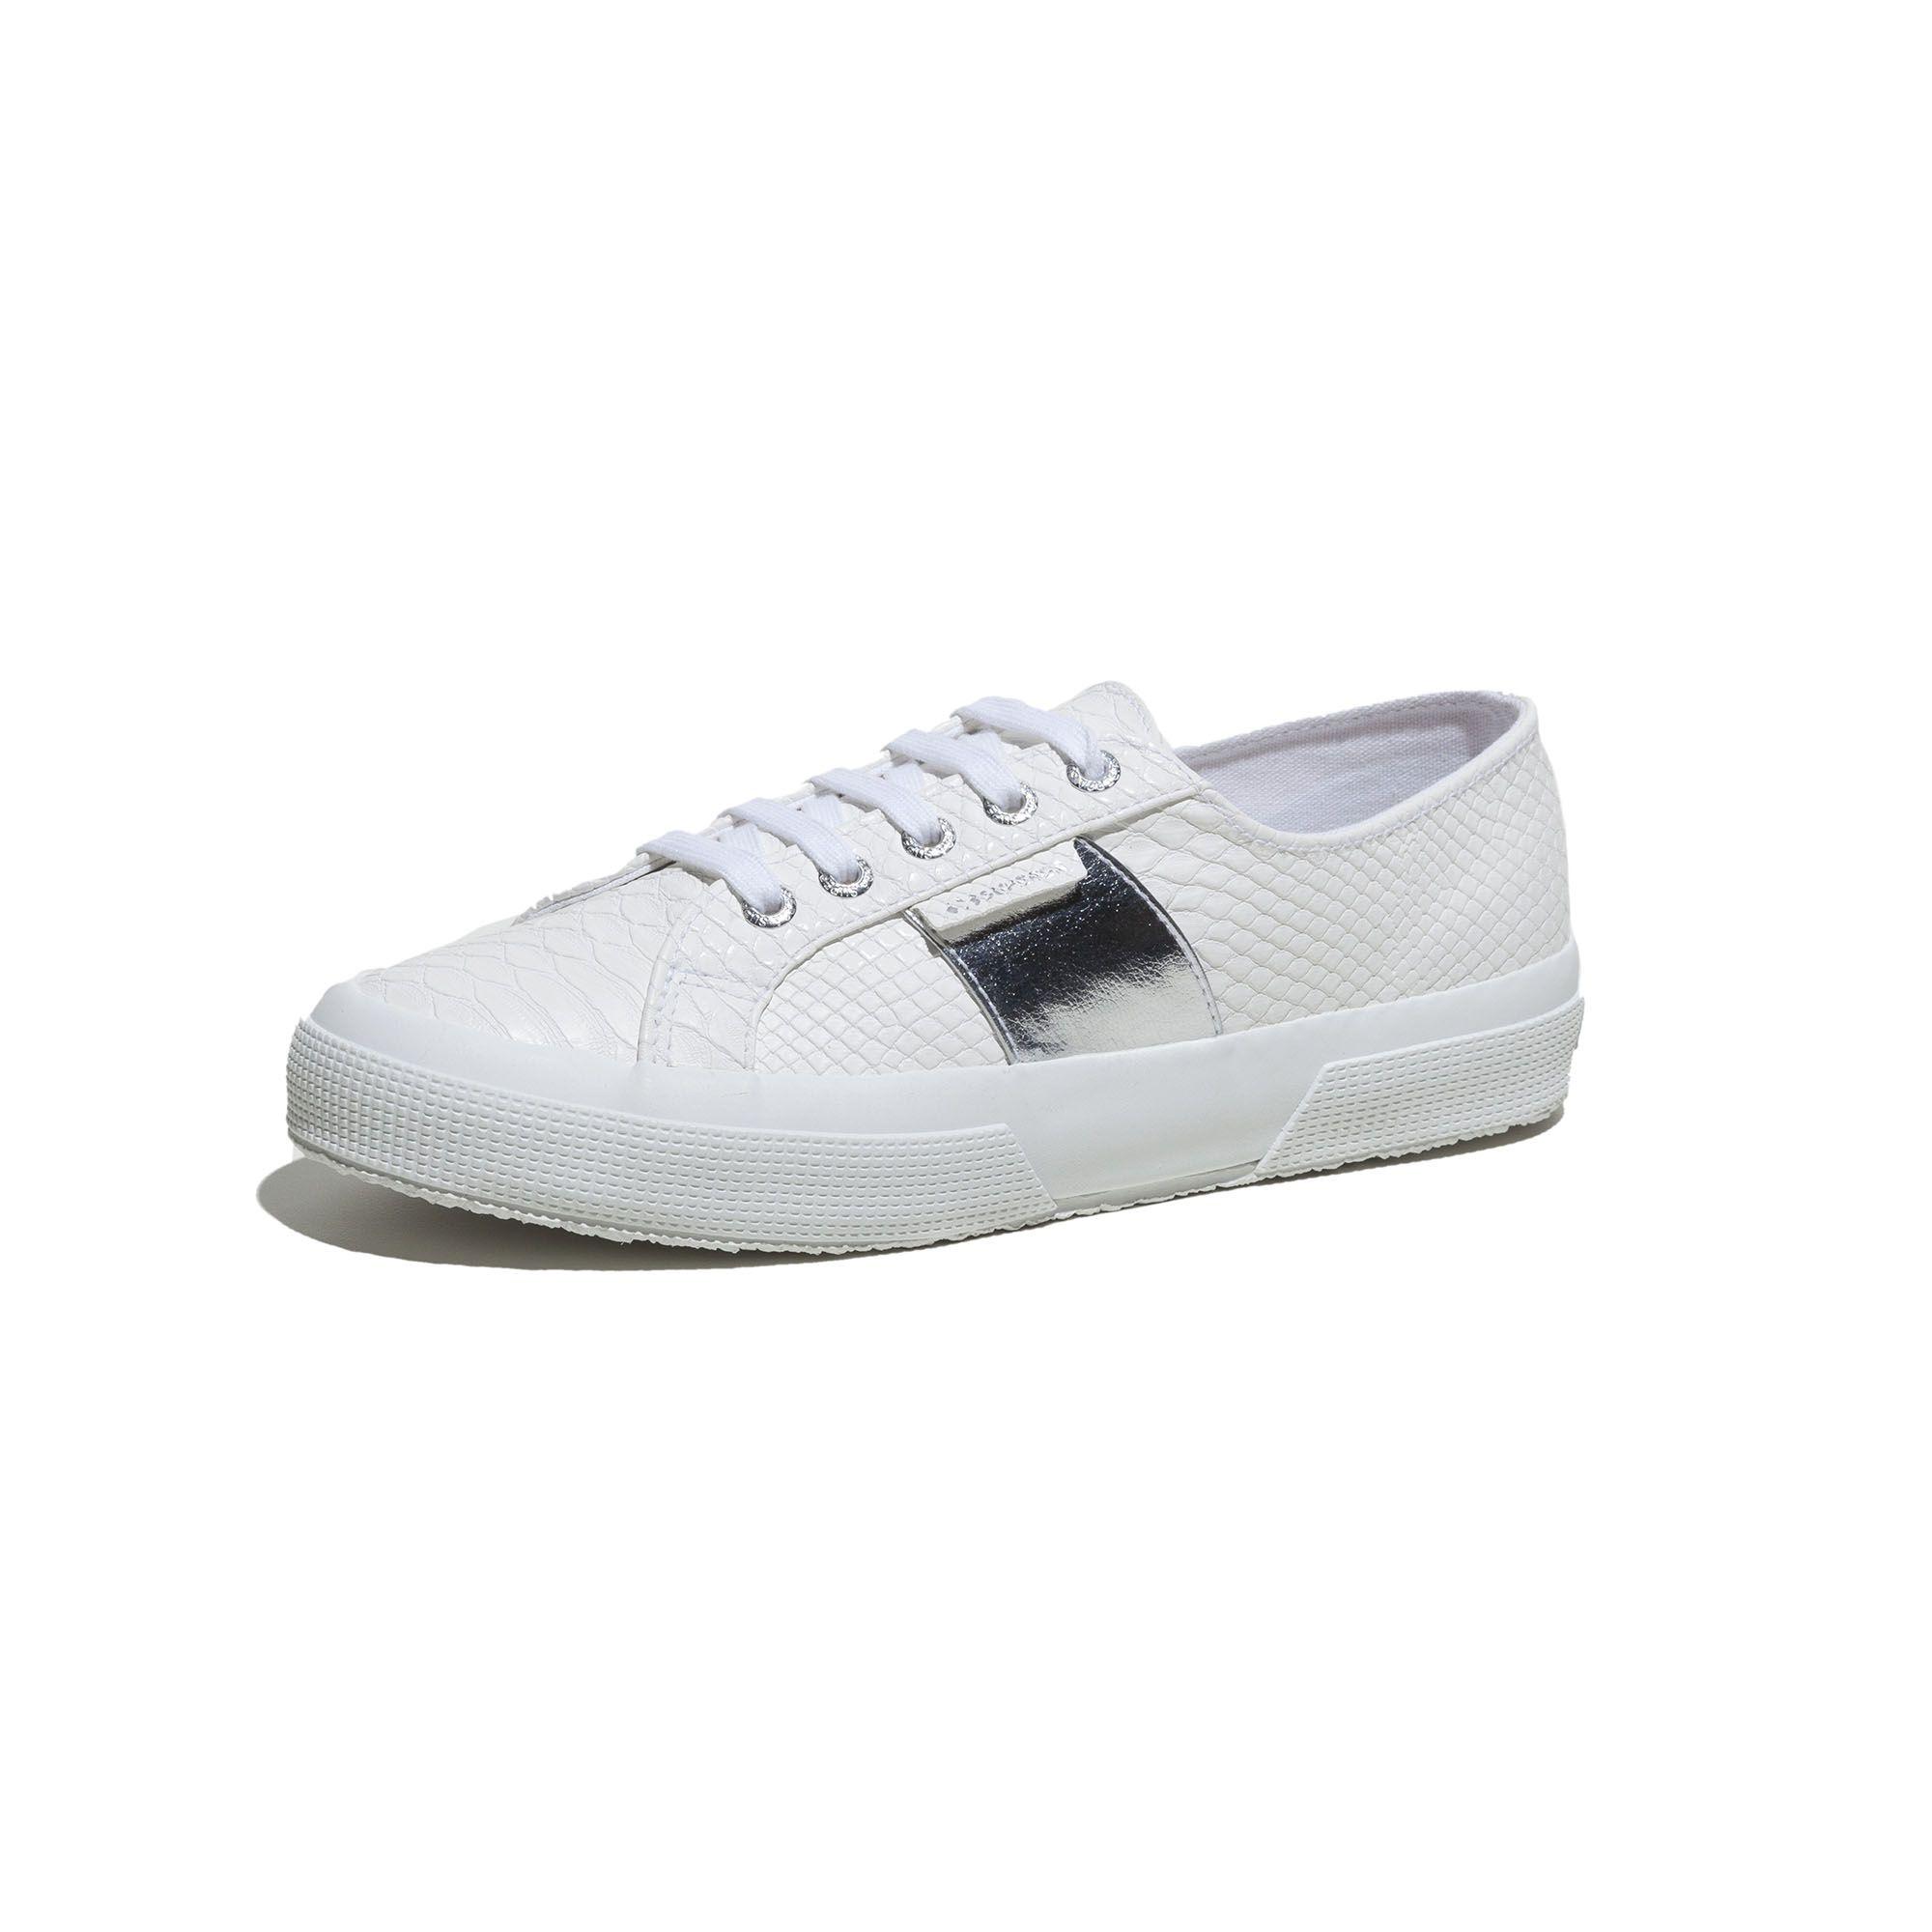 2750 COTU PUSNAKEW WHITE